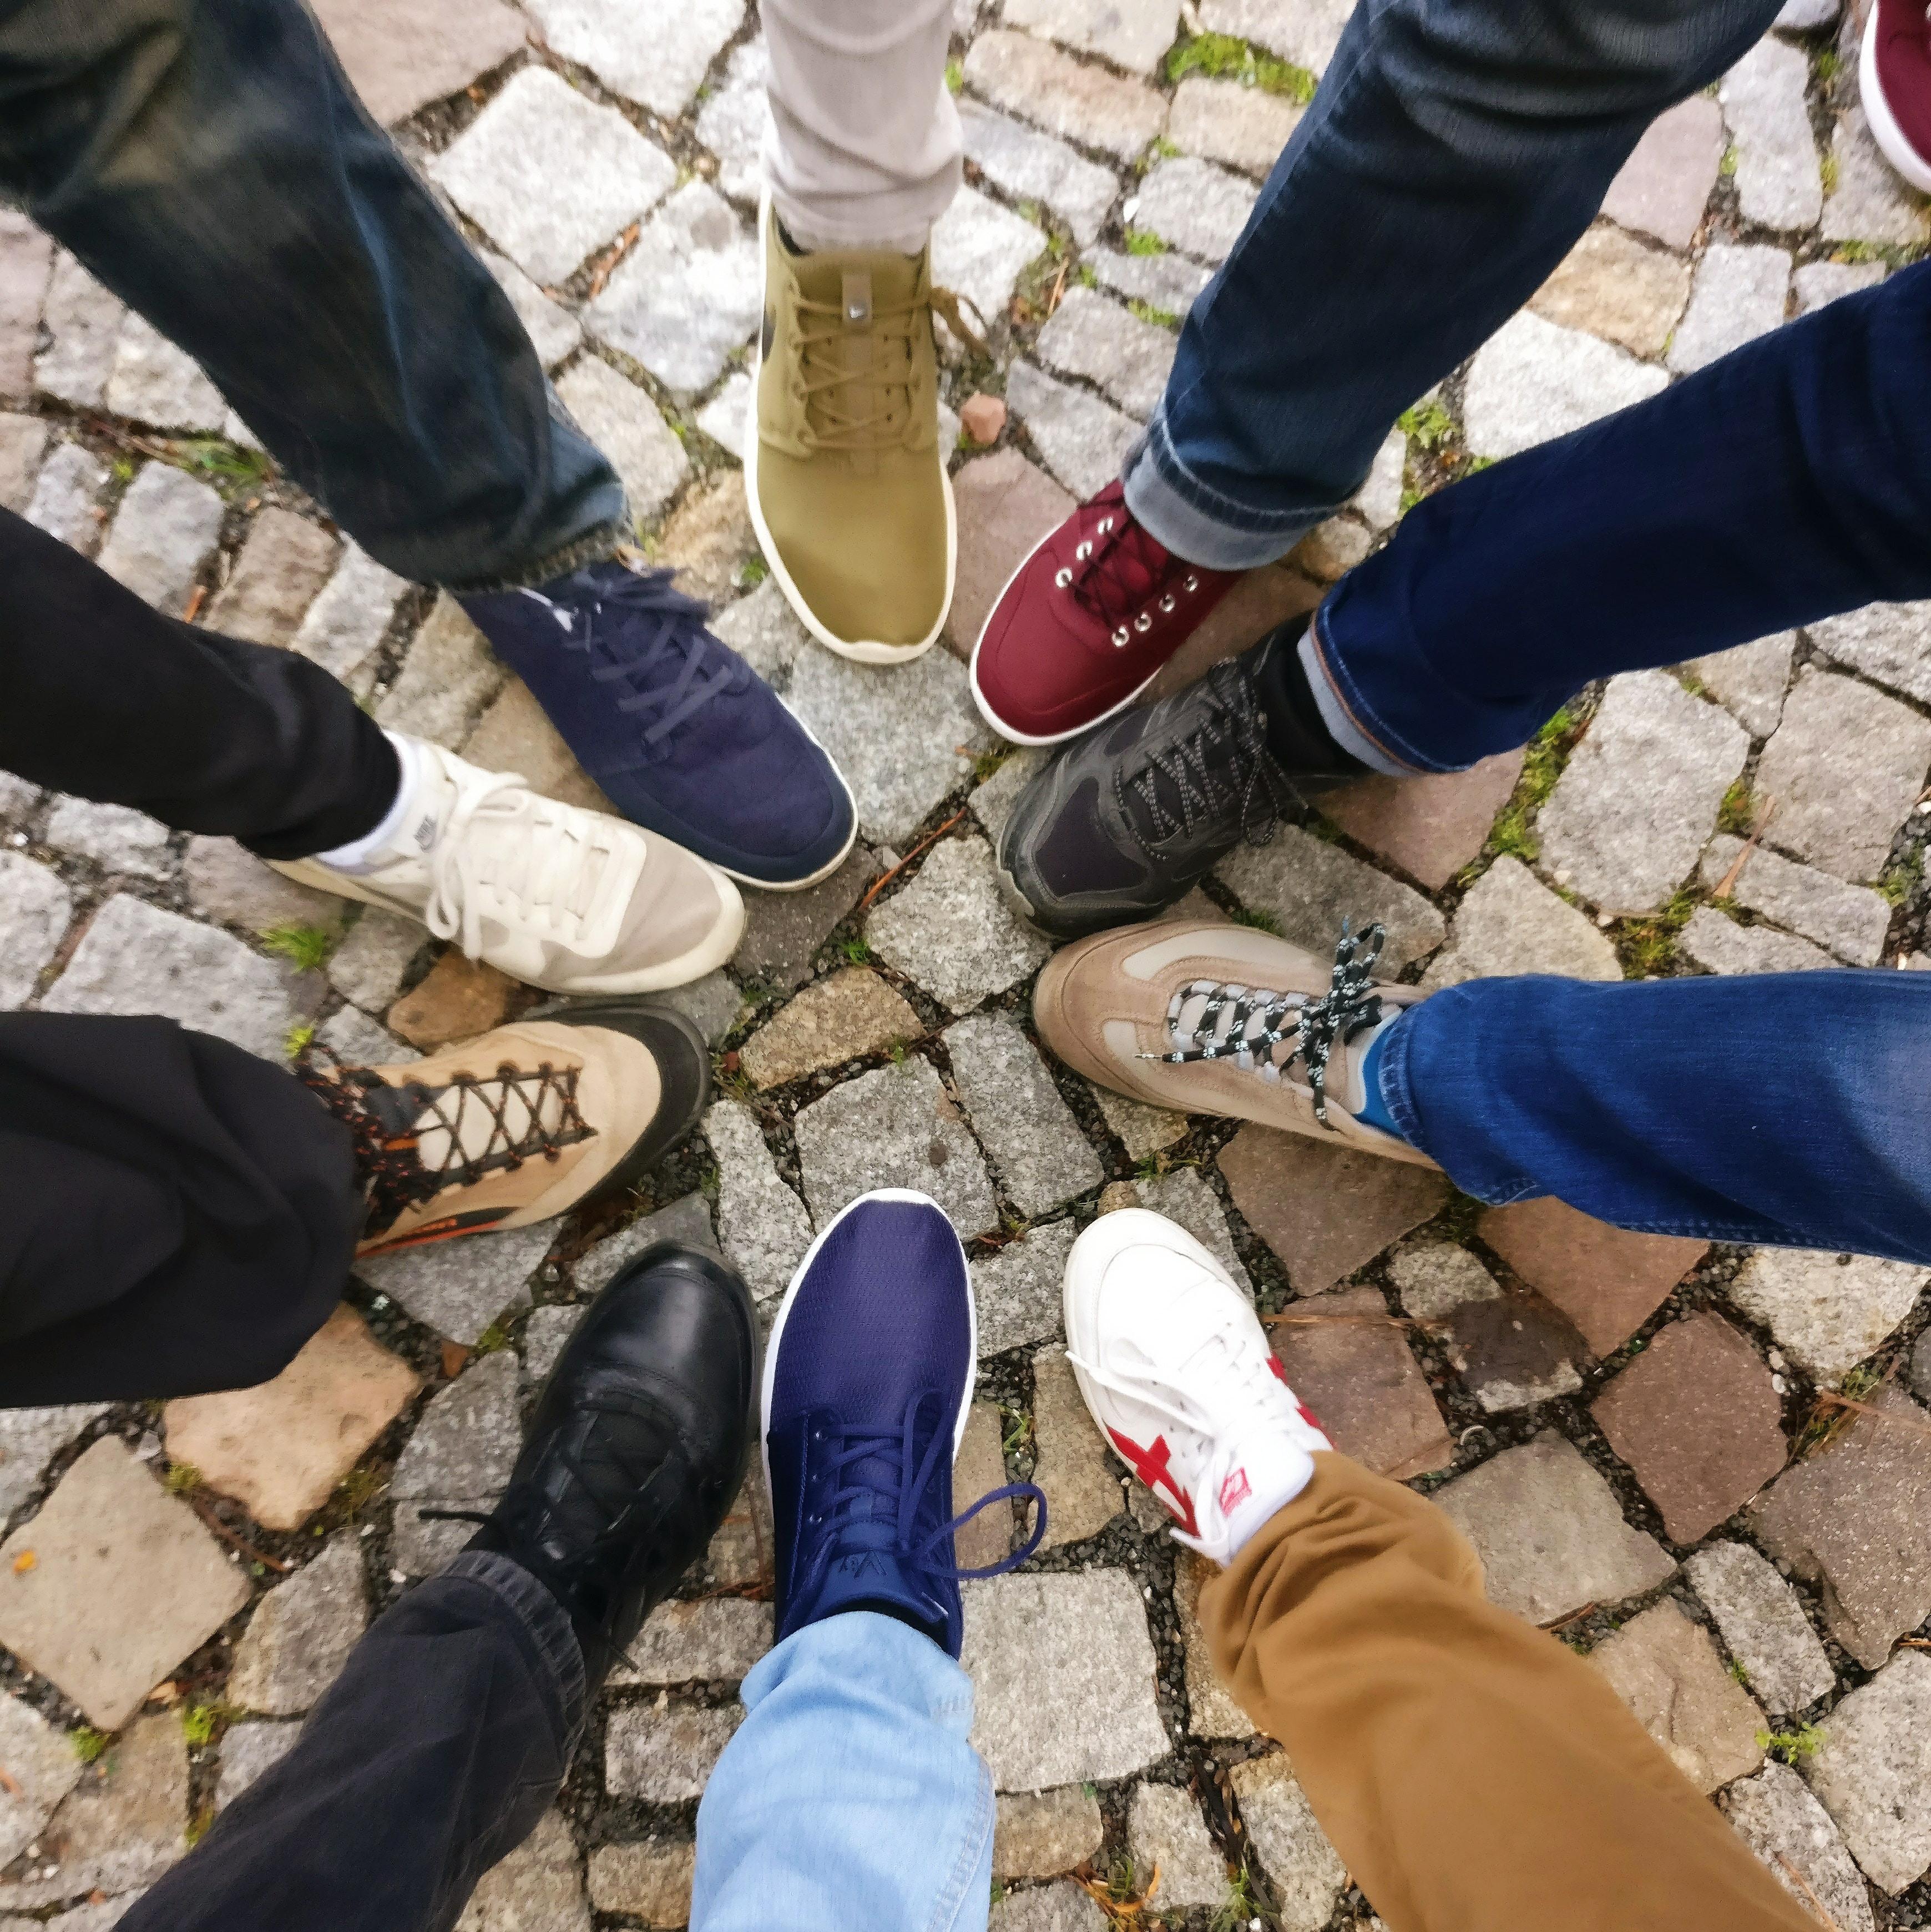 PEERS® Adolescents Social Skills Group